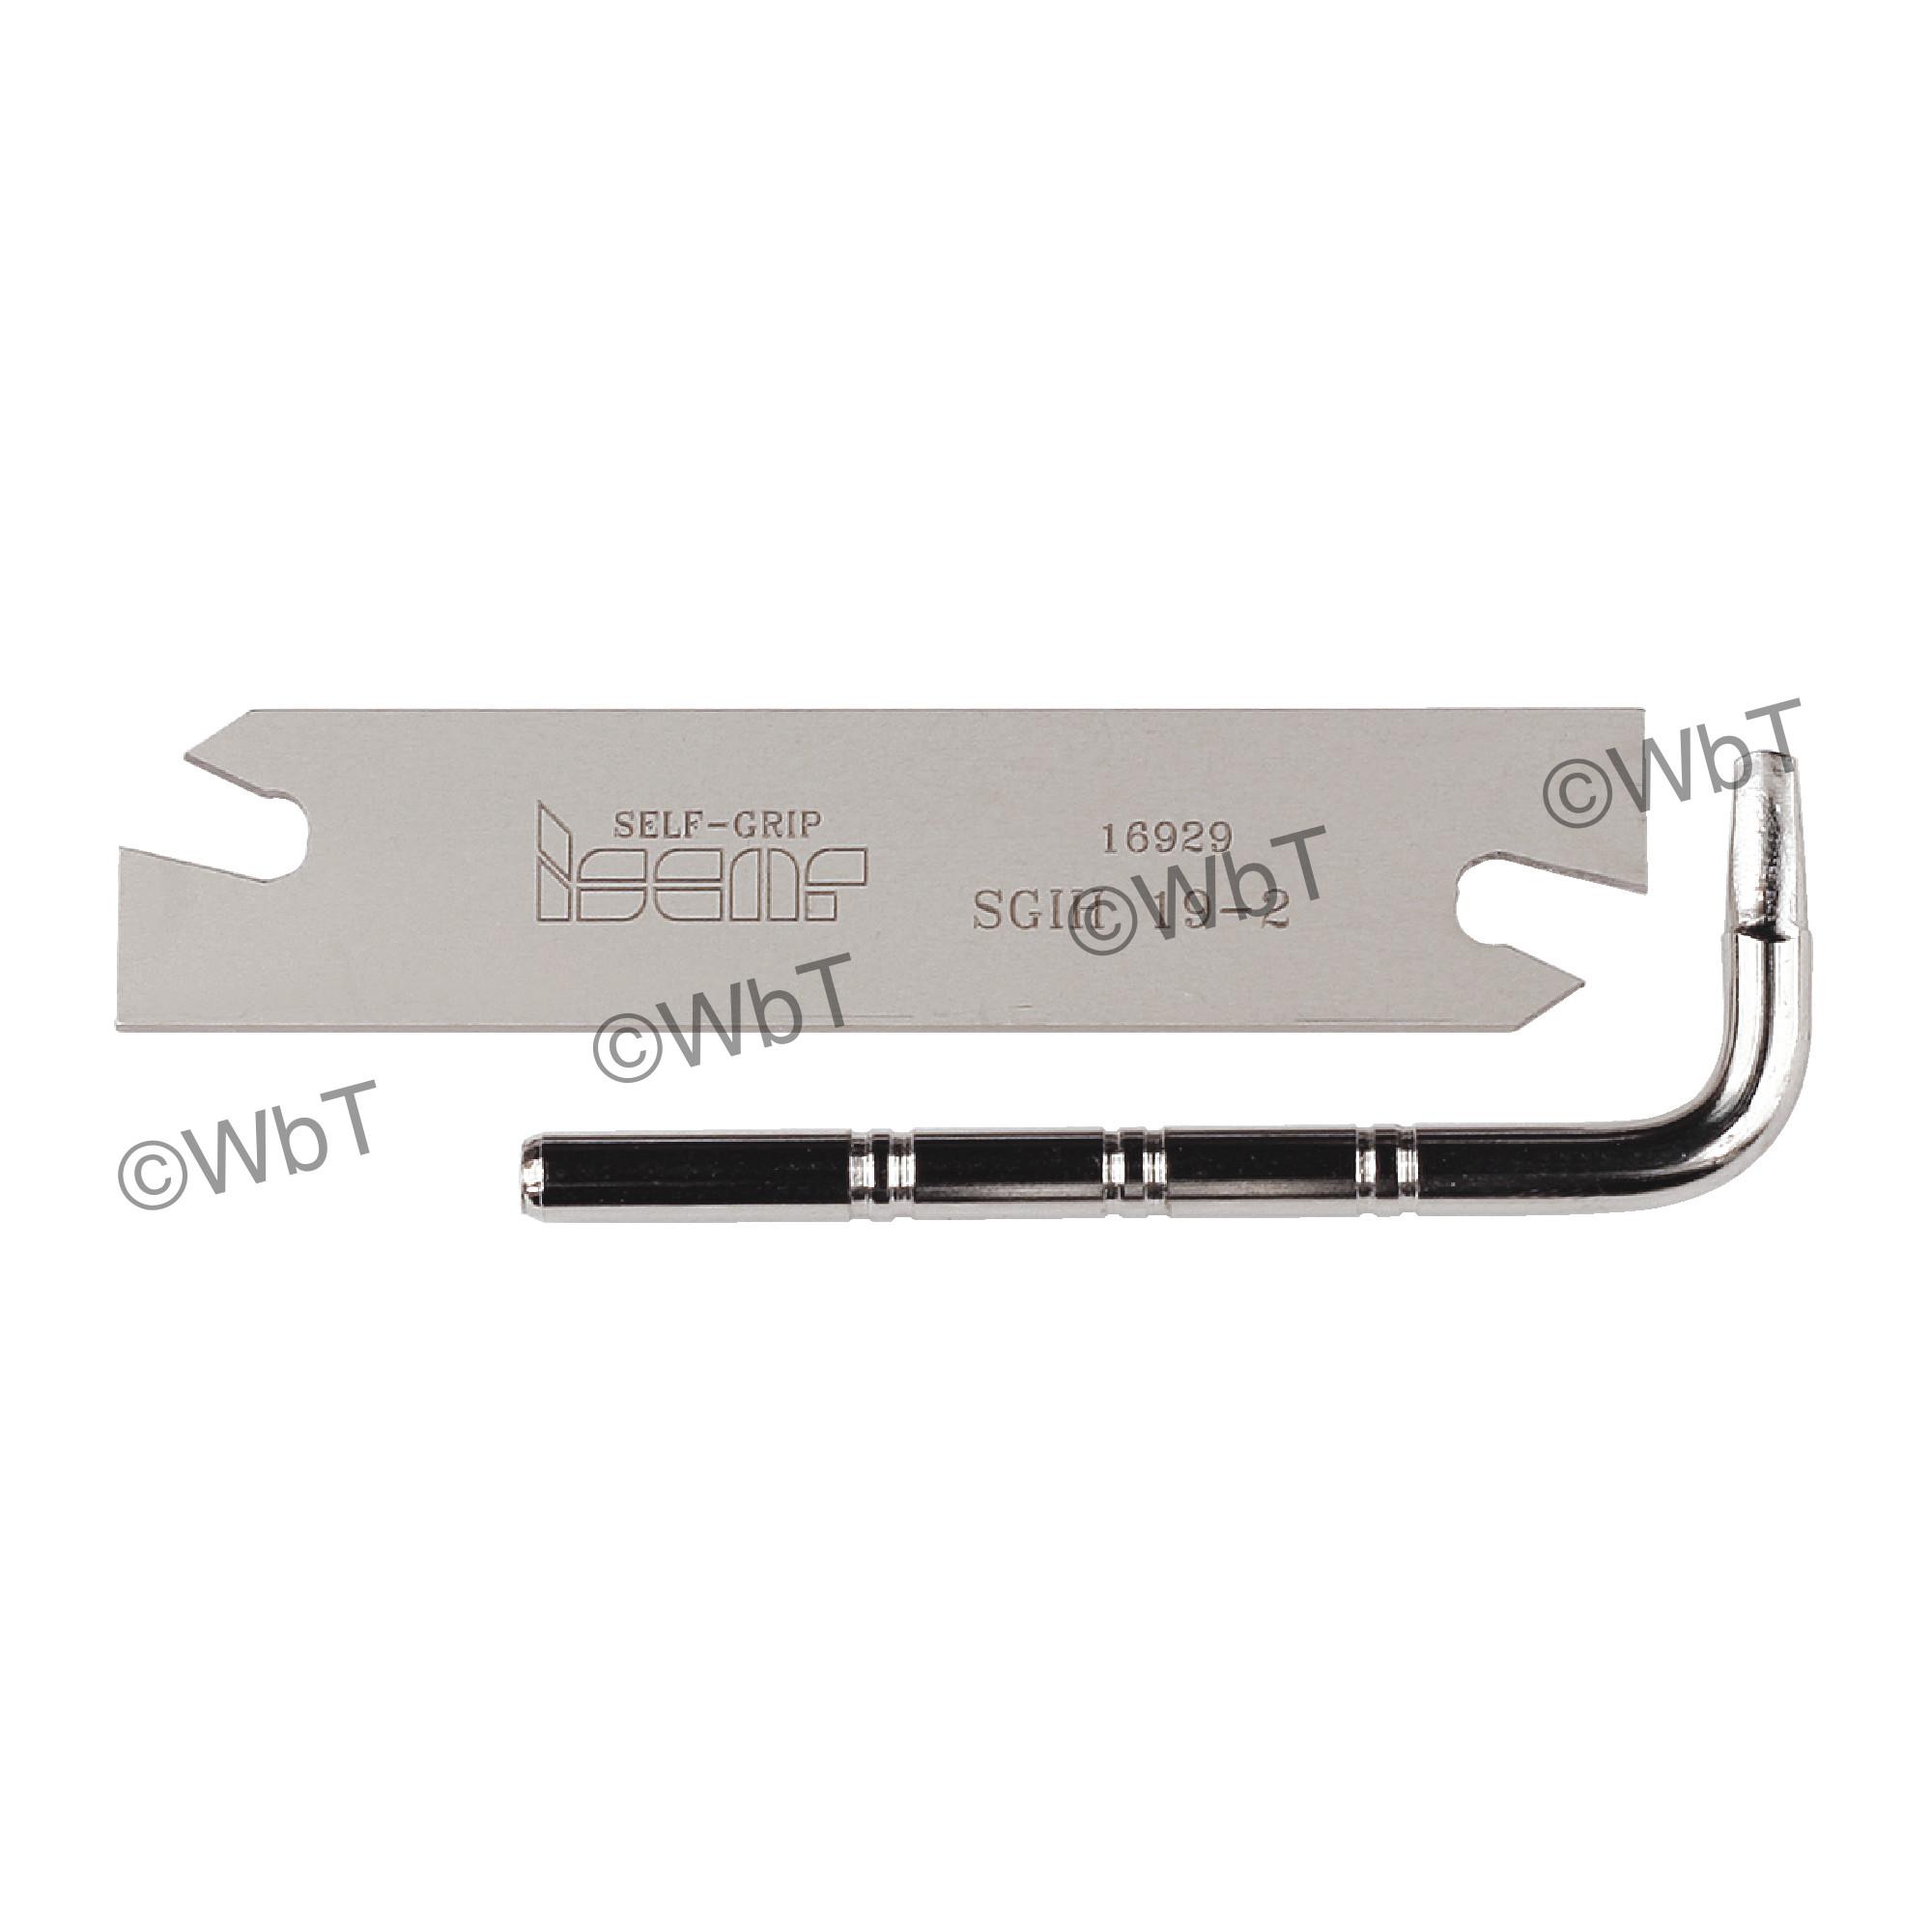 "ISCAR - SGIH 19-2 Parting Blade / GTN 2 Inserts / 3/4"" (19mm) Blade Height / NEUTRAL"